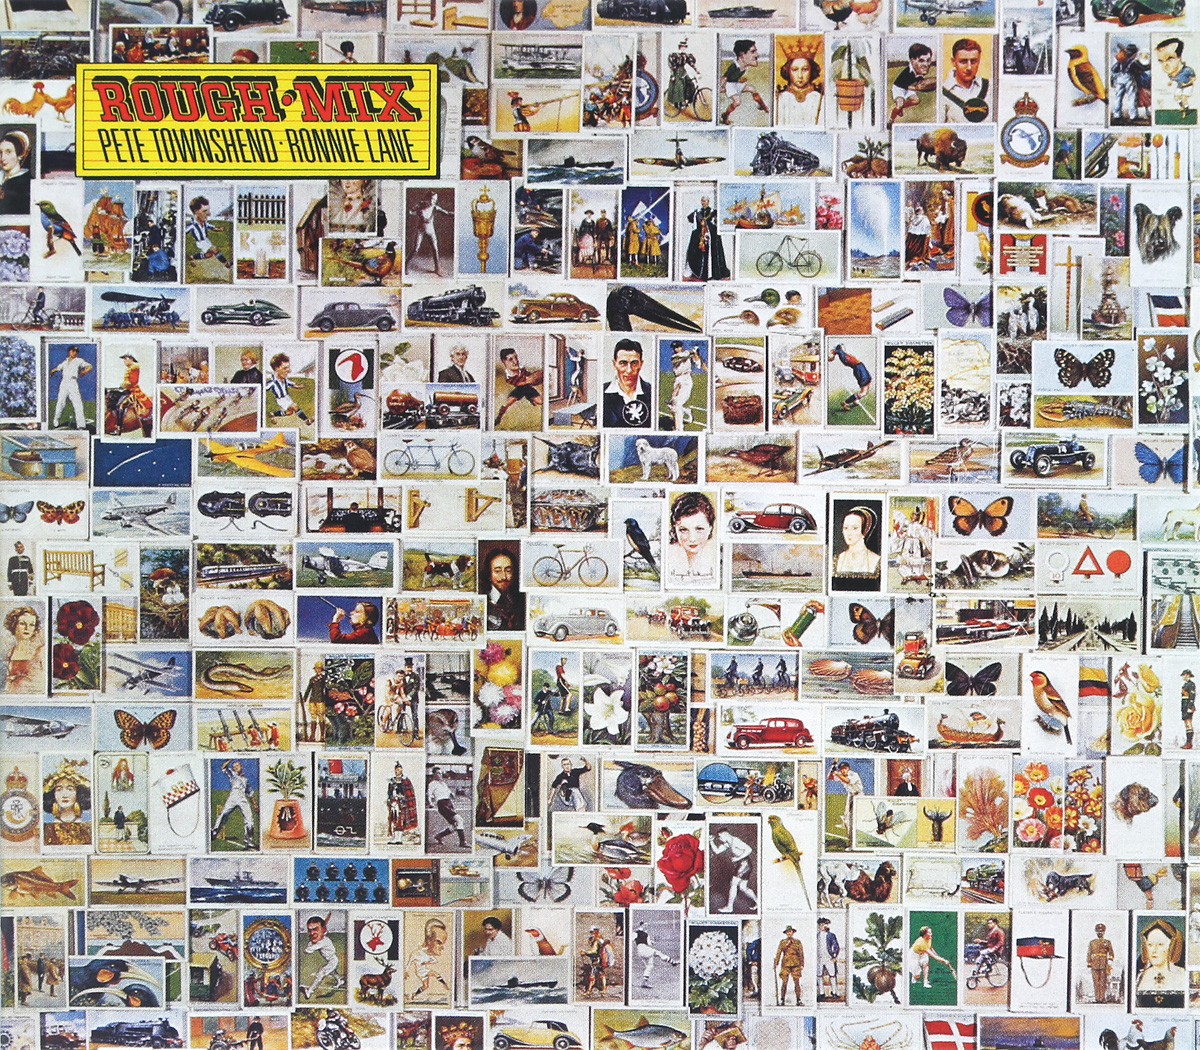 Пит Тауншенд,Ронни Лейн Pete Townshend & Ronnie Lane. Rough Mix ronnie lane ronnie lane one for the road